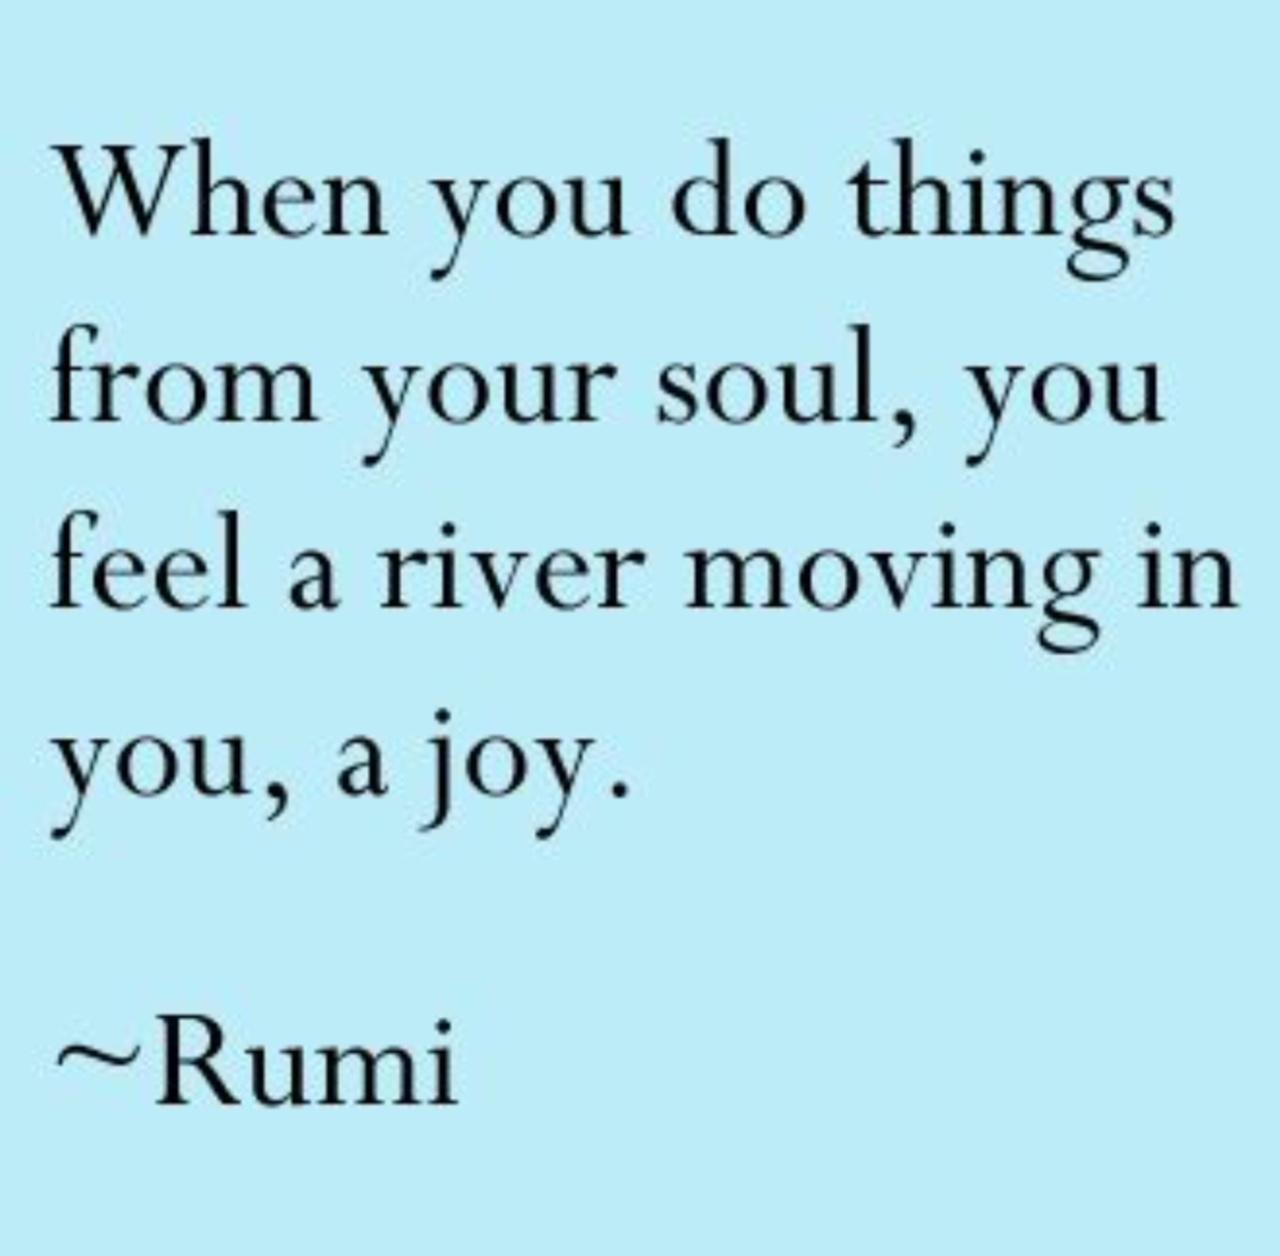 Rumi_3.jpg